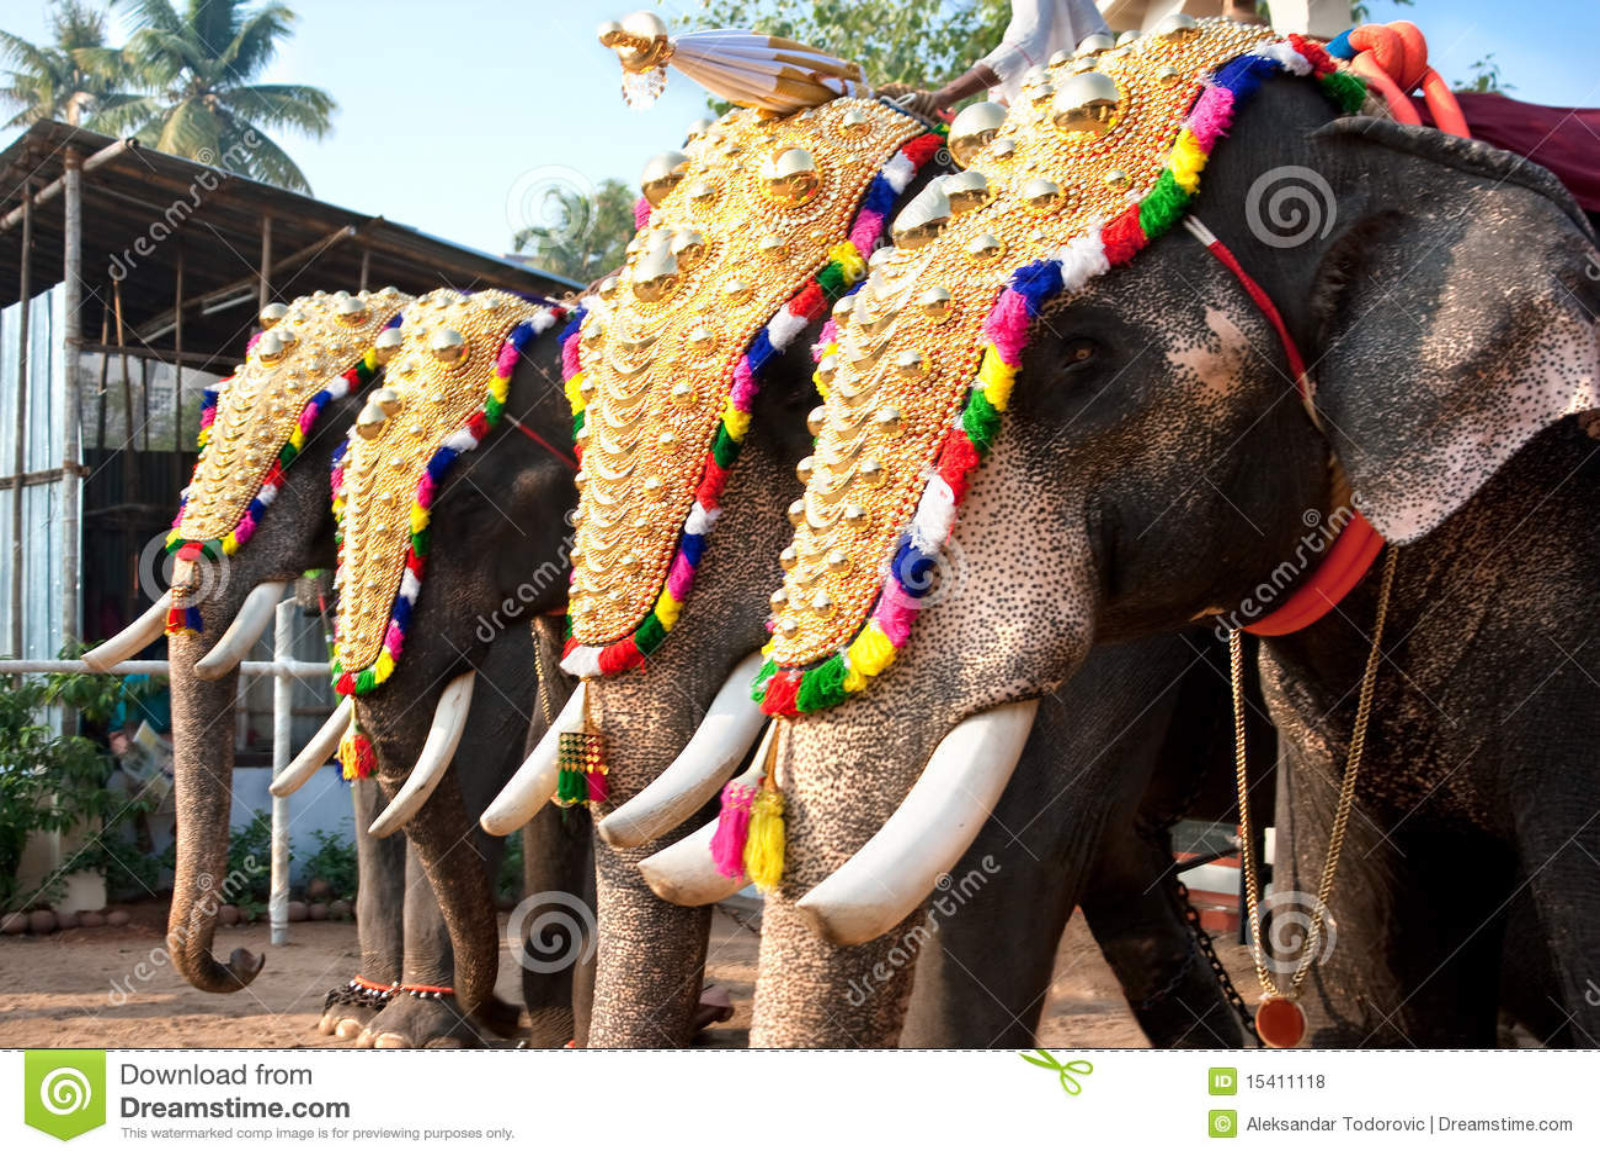 Decorated Elephants For Parade Stock Photo - Image: 15411118